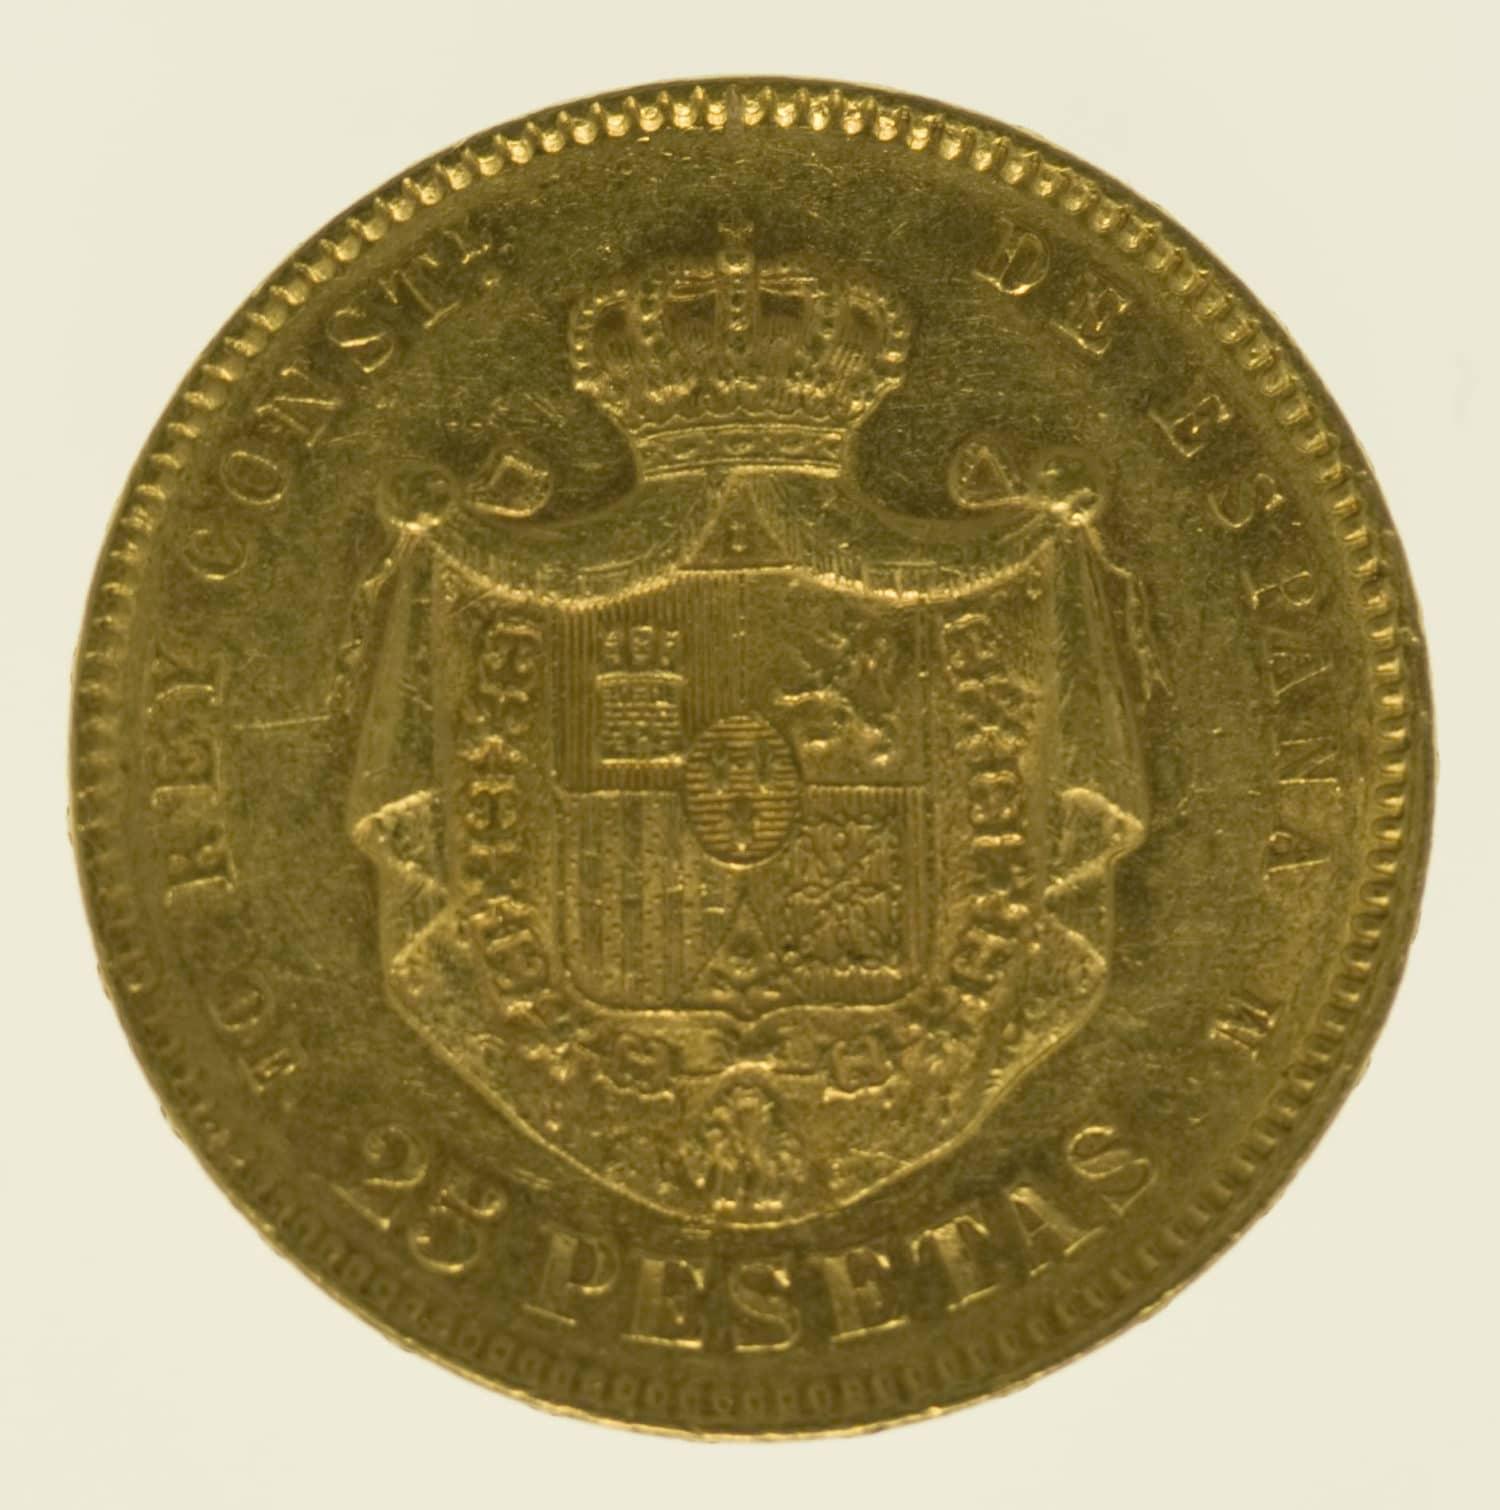 spanien - Spanien Alfonso XII. 25 Pesetas 1877 / 18-77